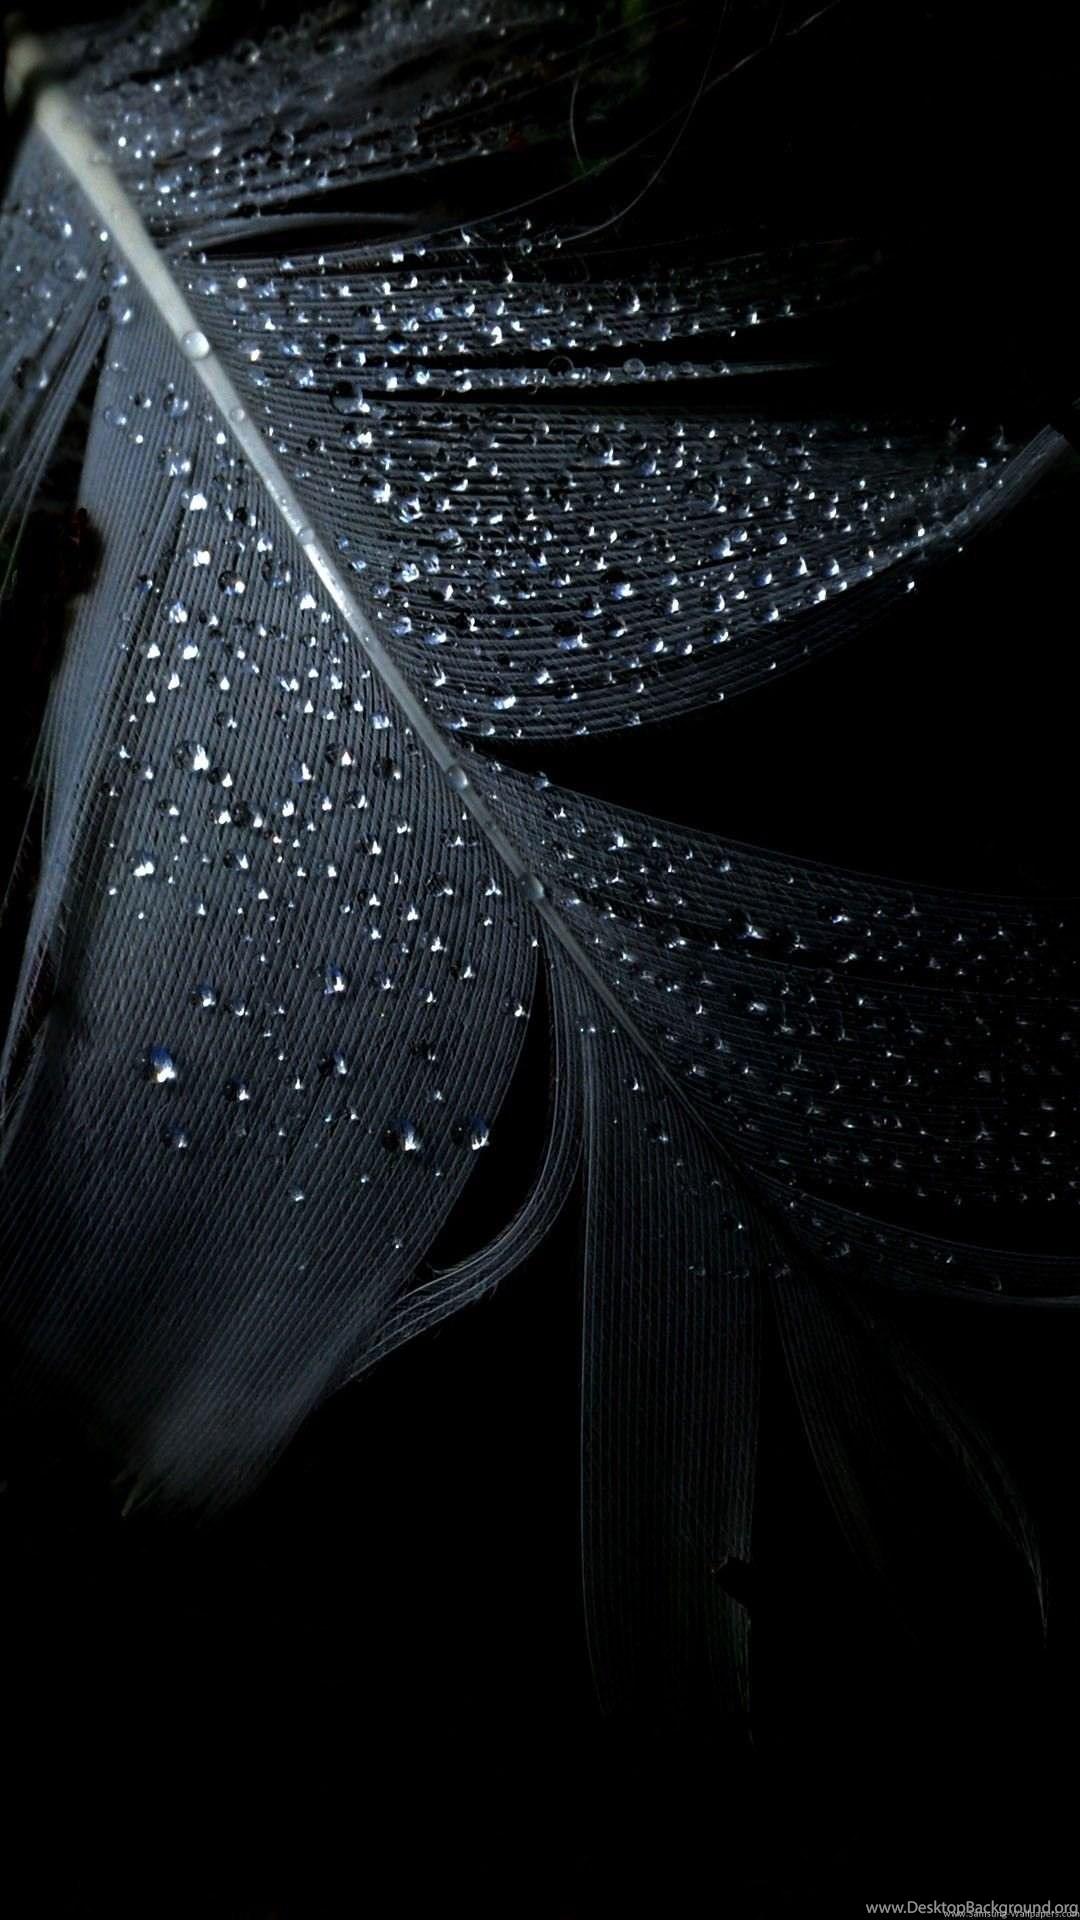 Solid Black Wallpapers Hd Cutewallpaper Org Desktop Background